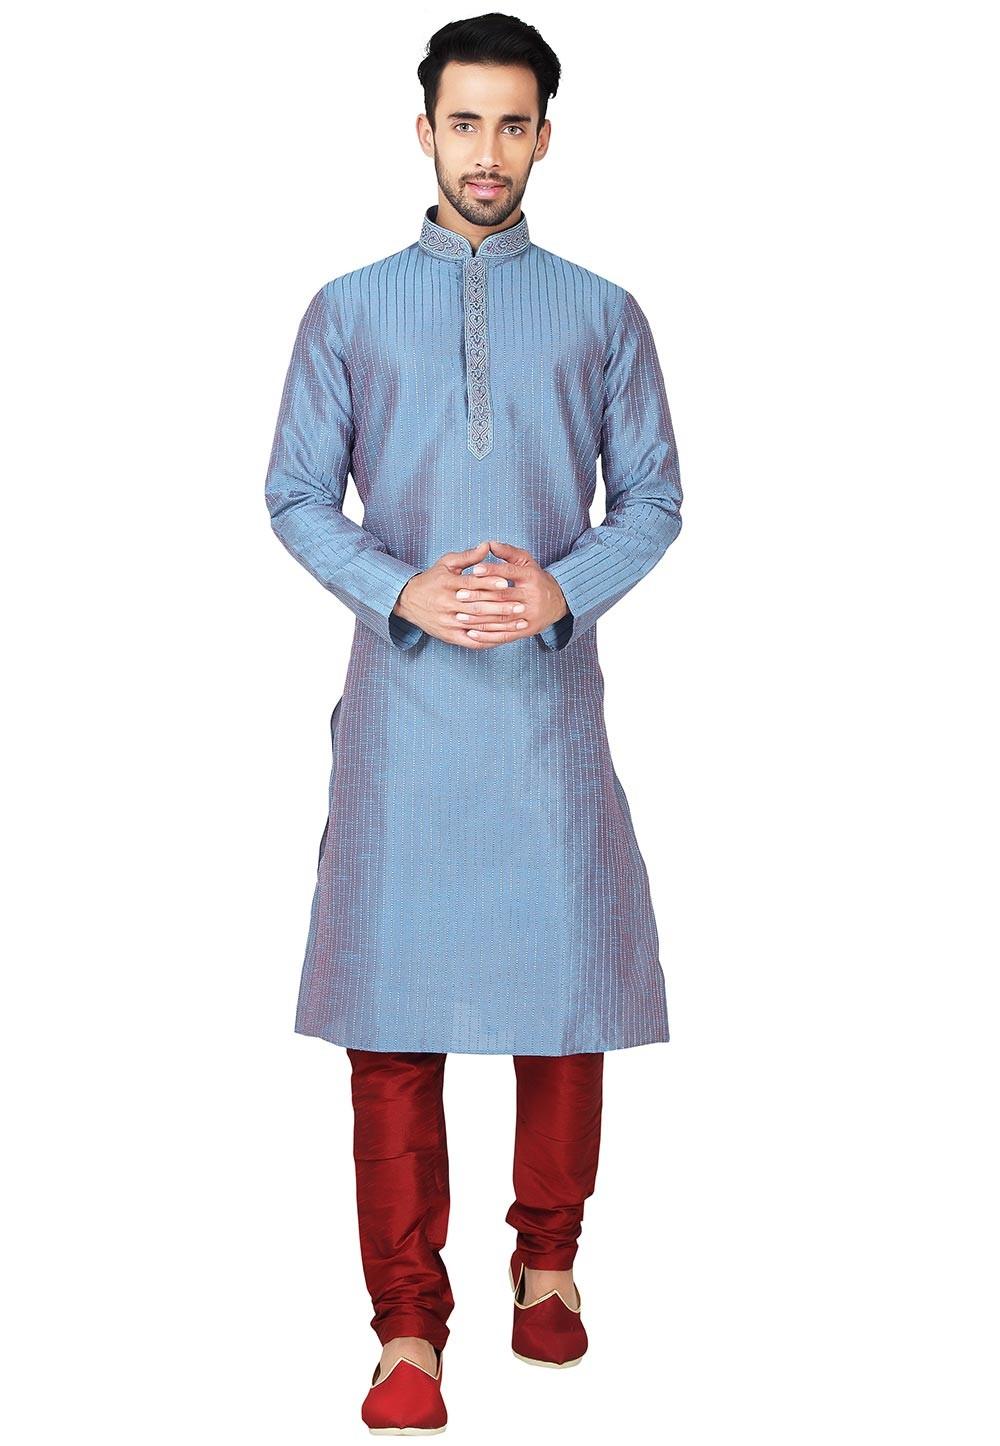 Exquisite Green Color Art Silk Fabric Readymade Kurta Pajama With Thread Work.